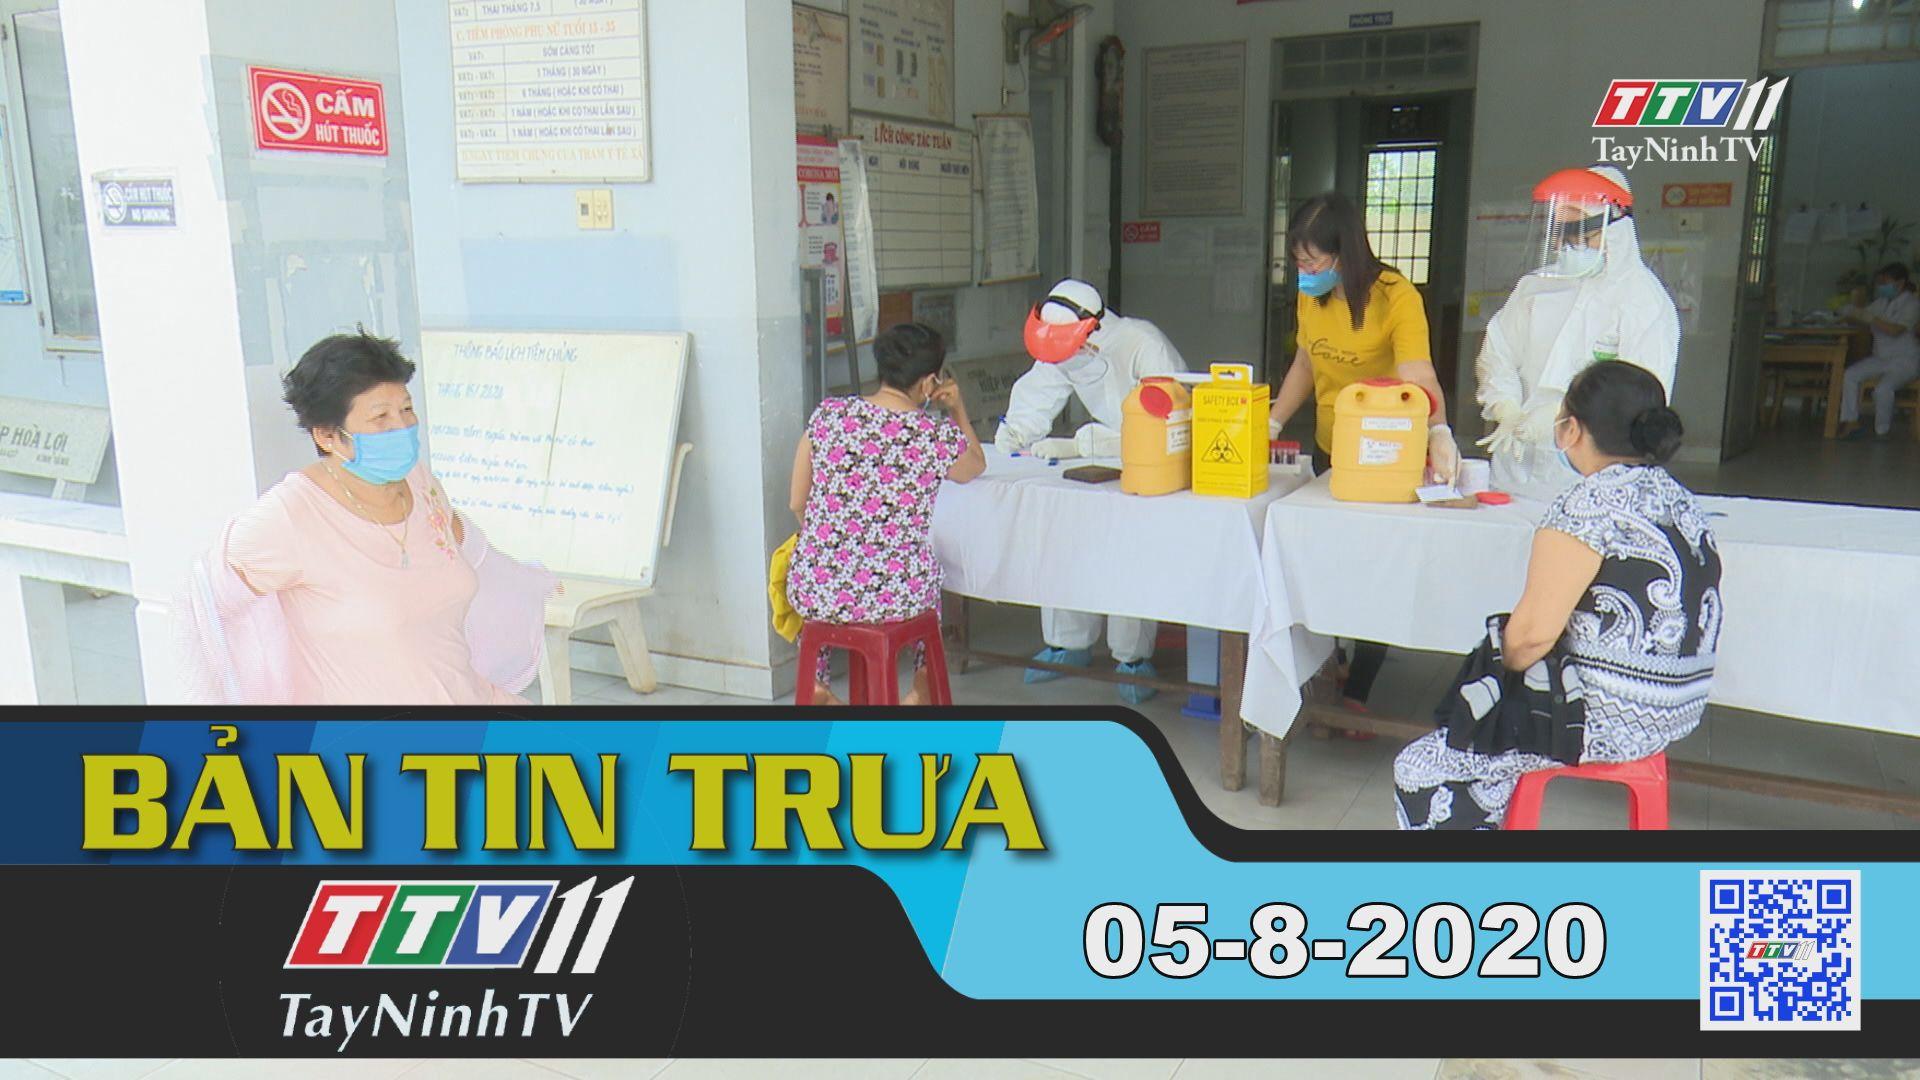 Bản tin trưa 05-8-2020 | Tin tức hôm nay | TayNinhTV